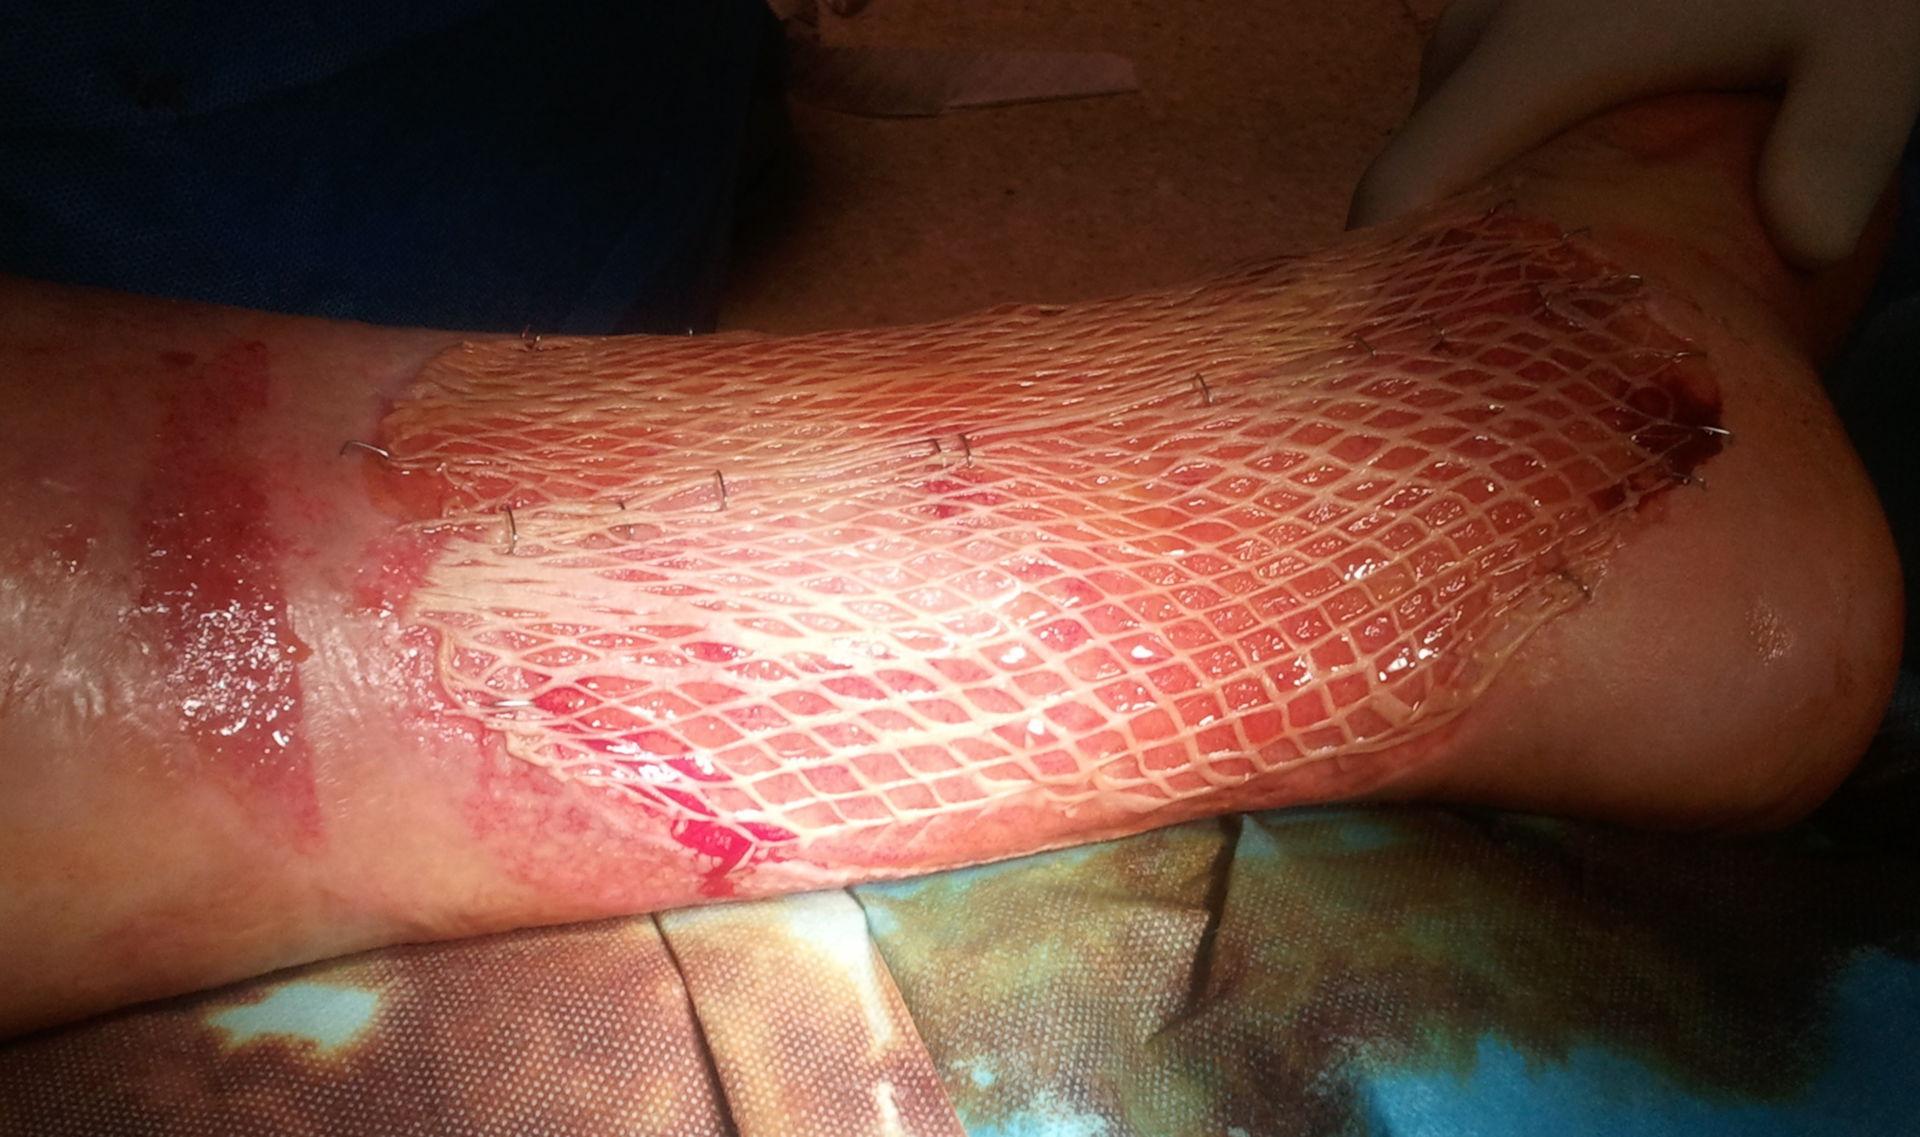 Ulcera crurale - Meshgraft